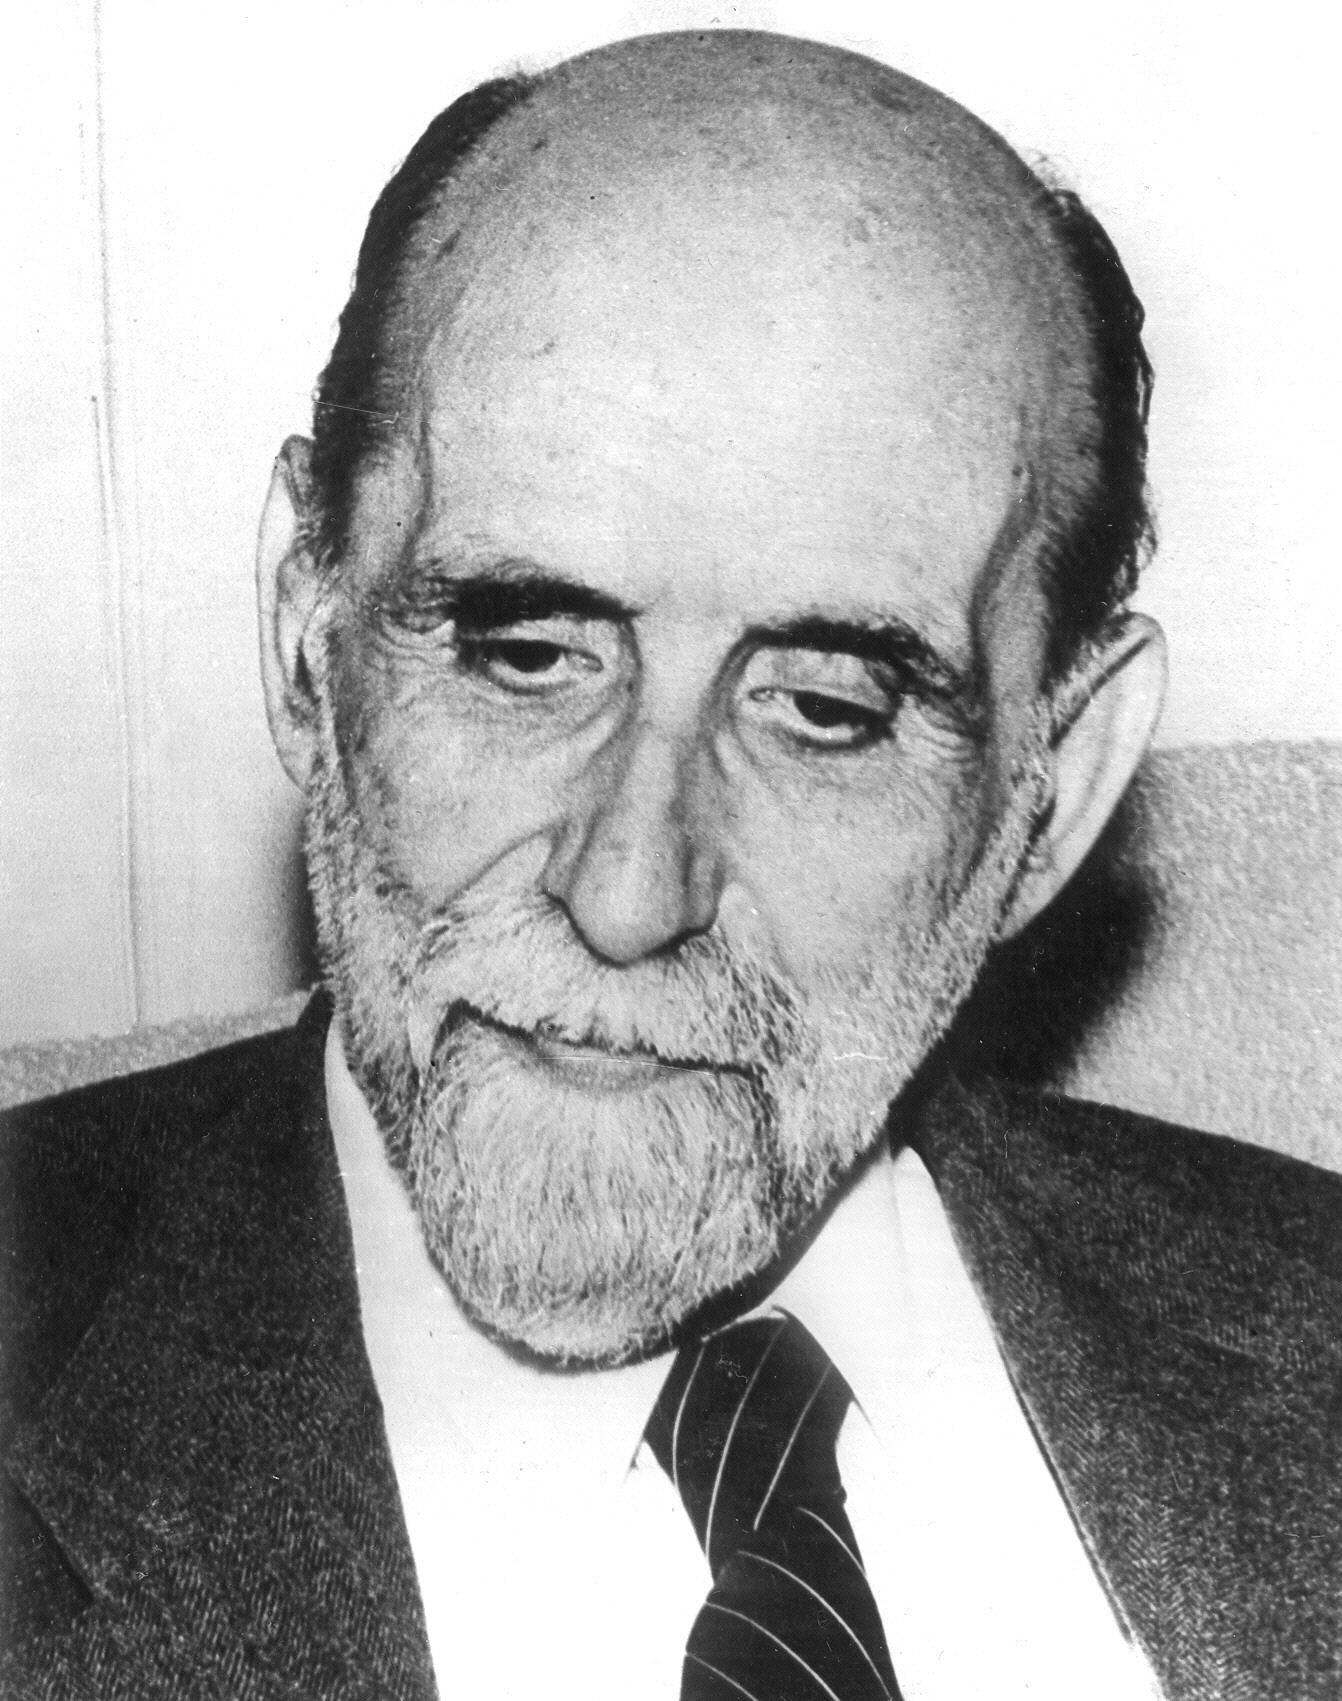 Poema de Juan Ramón Jiménez